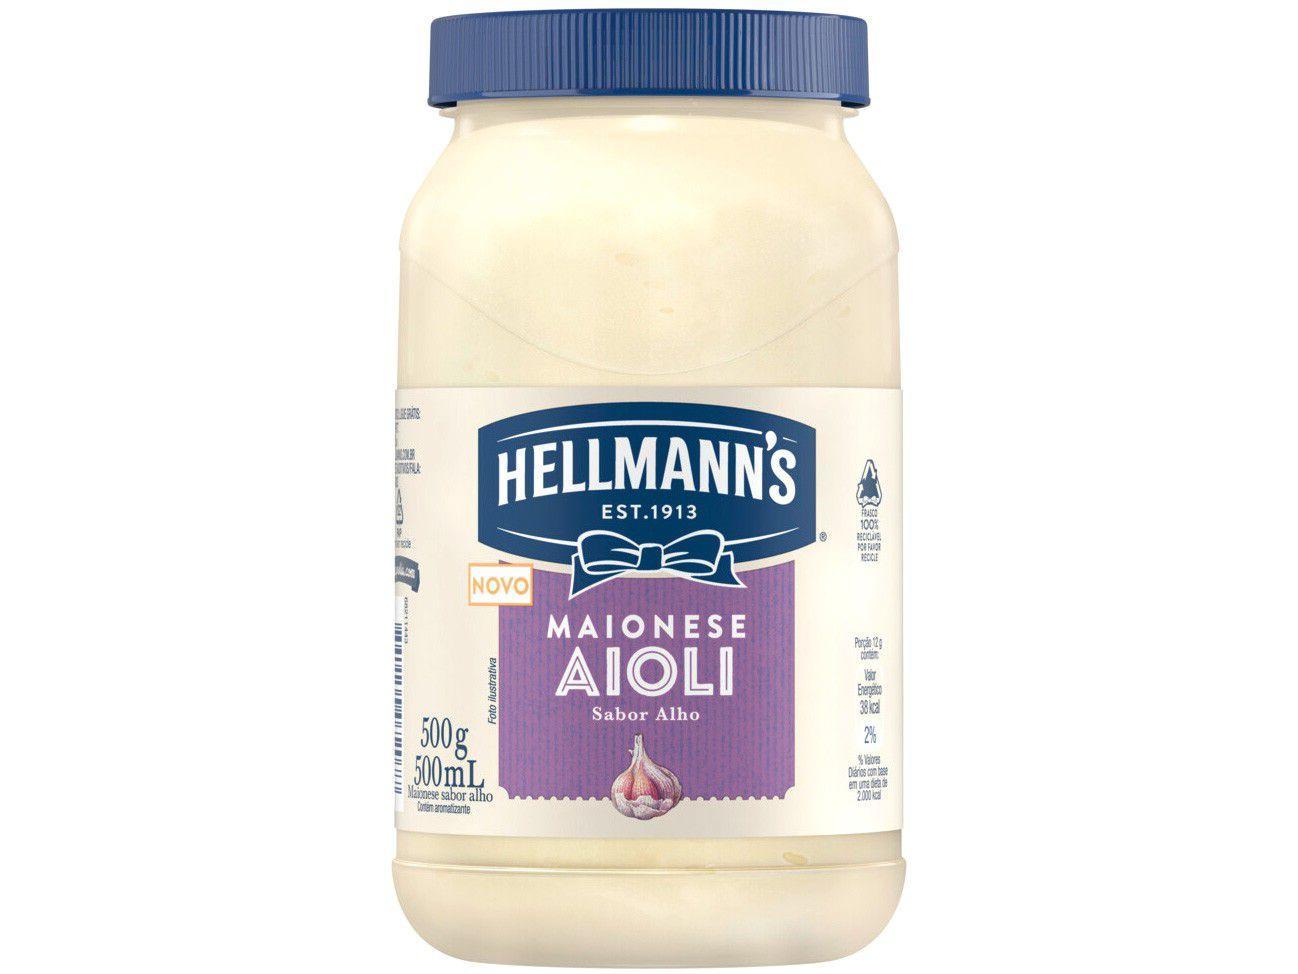 Maionese Hellmanns Alho Aioli 500g